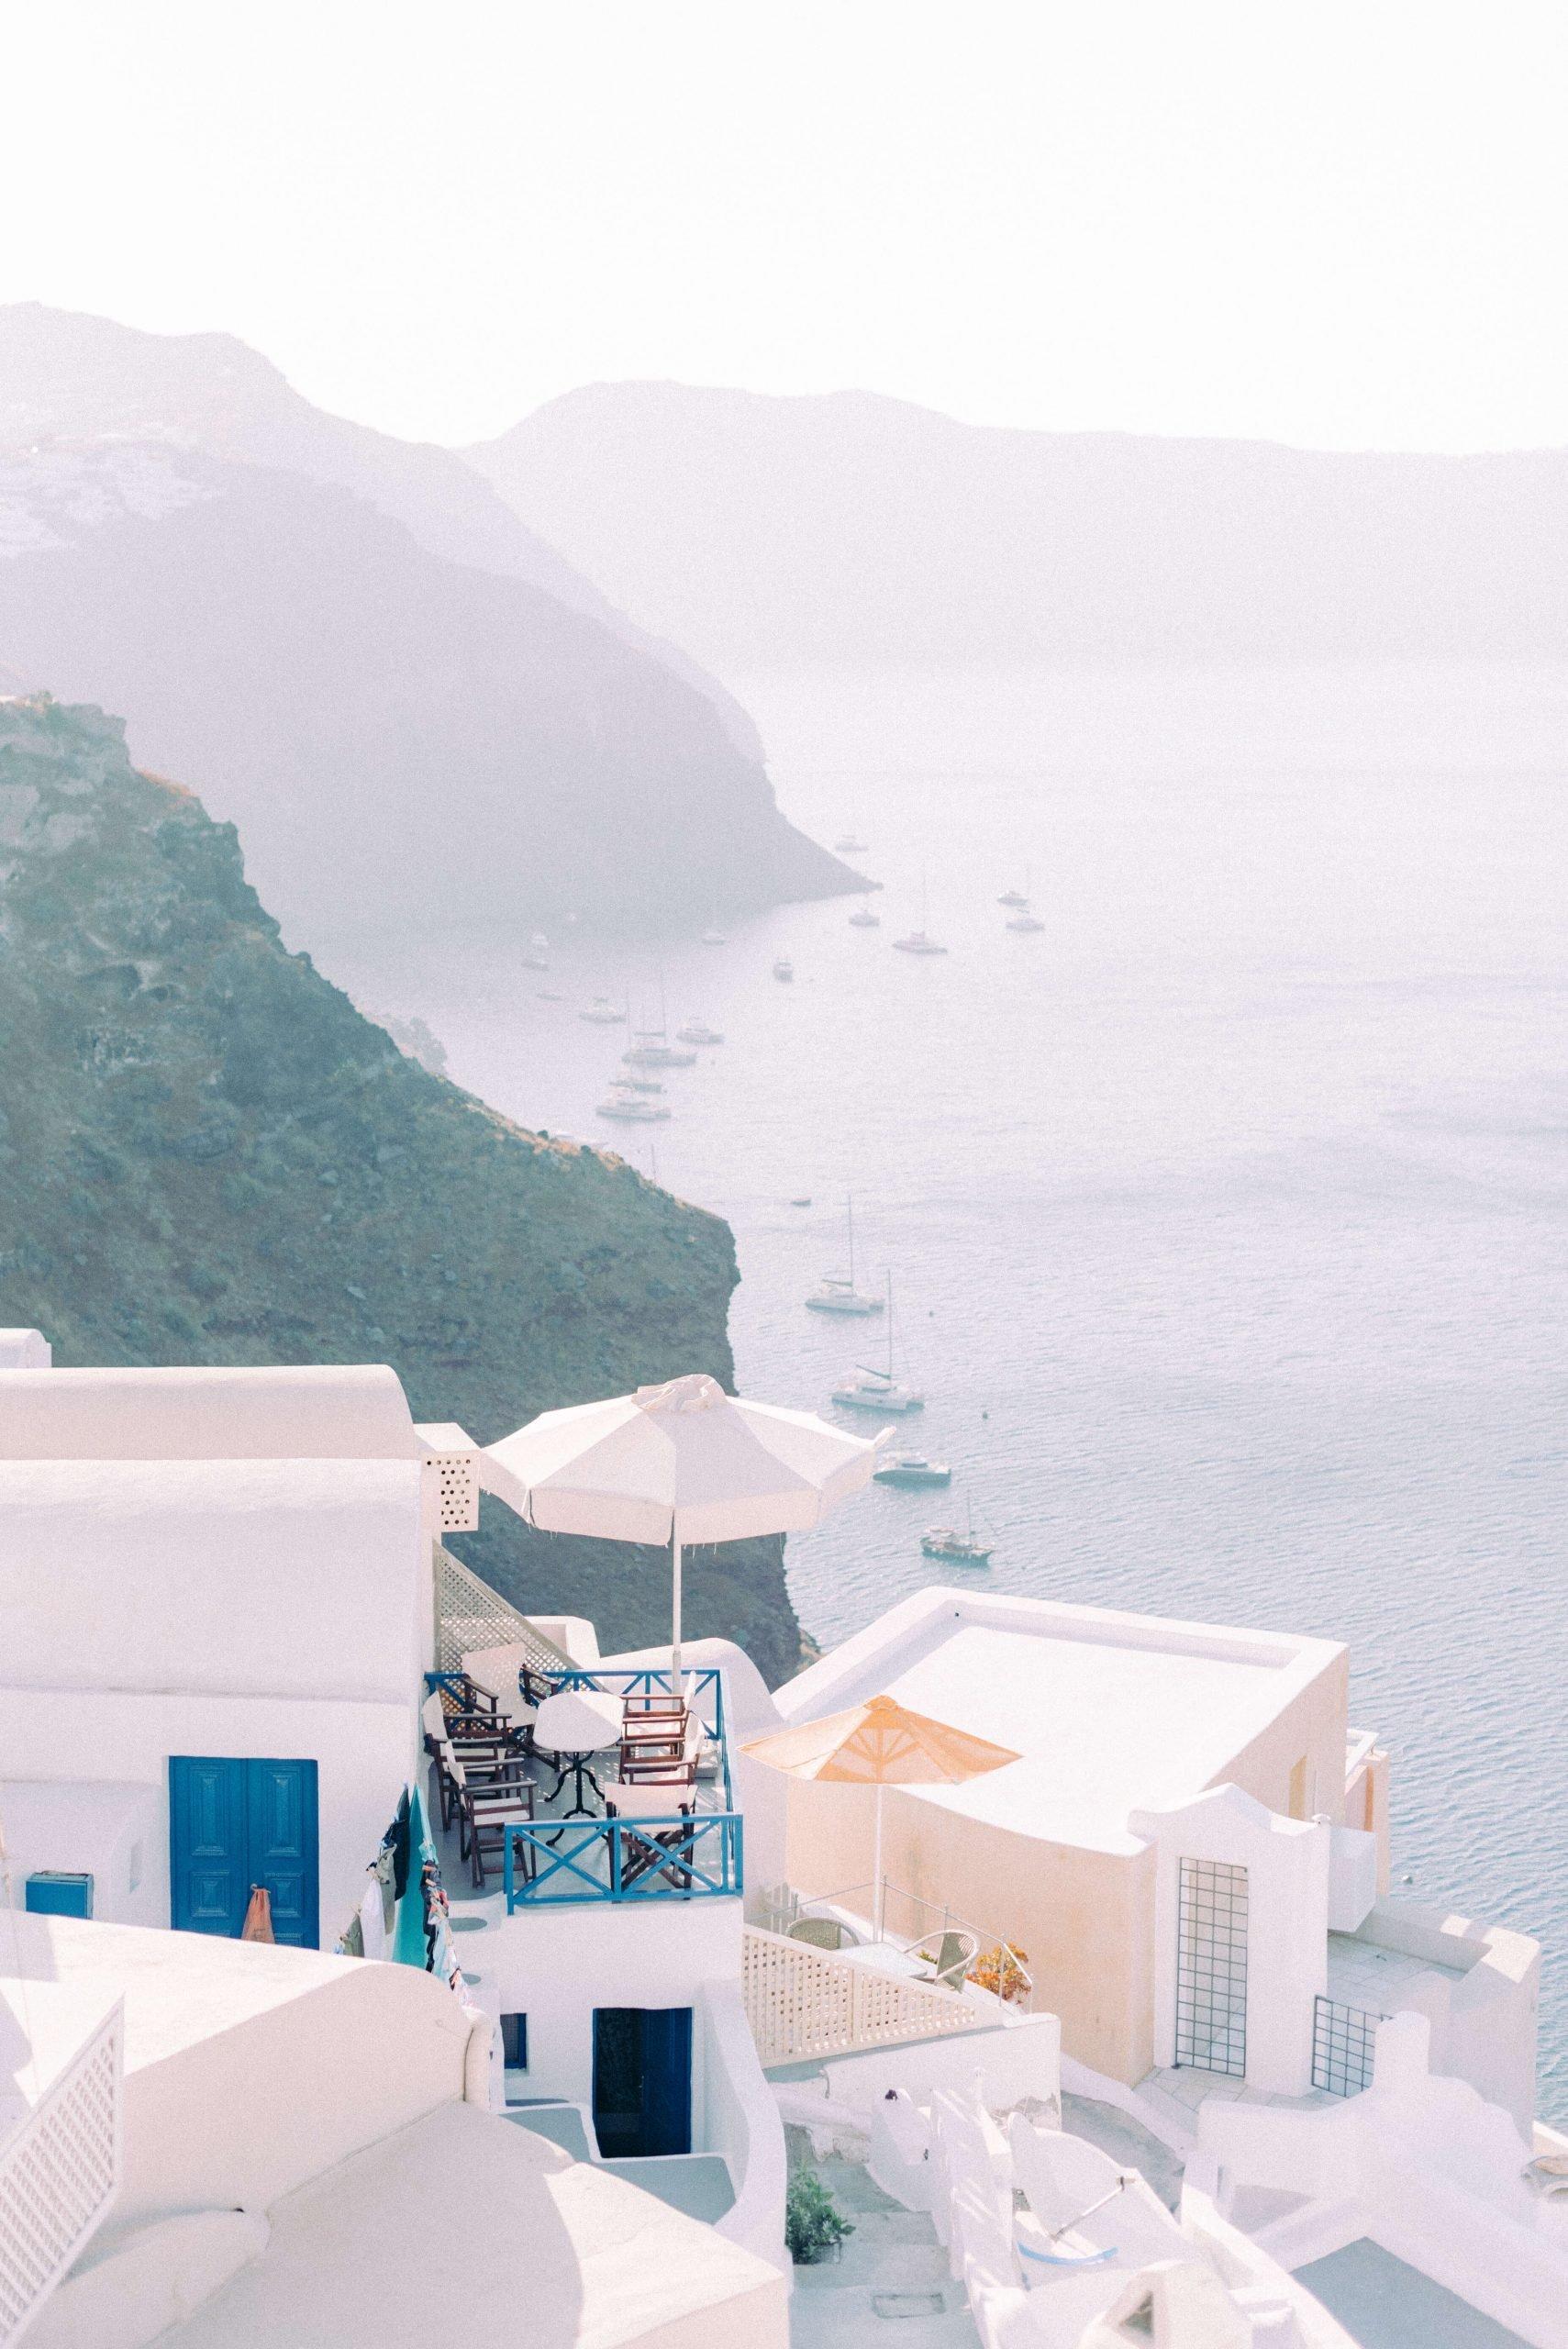 Greece view from Oia Santorini. Photography by Cristina Ilao www.cristinailao.com